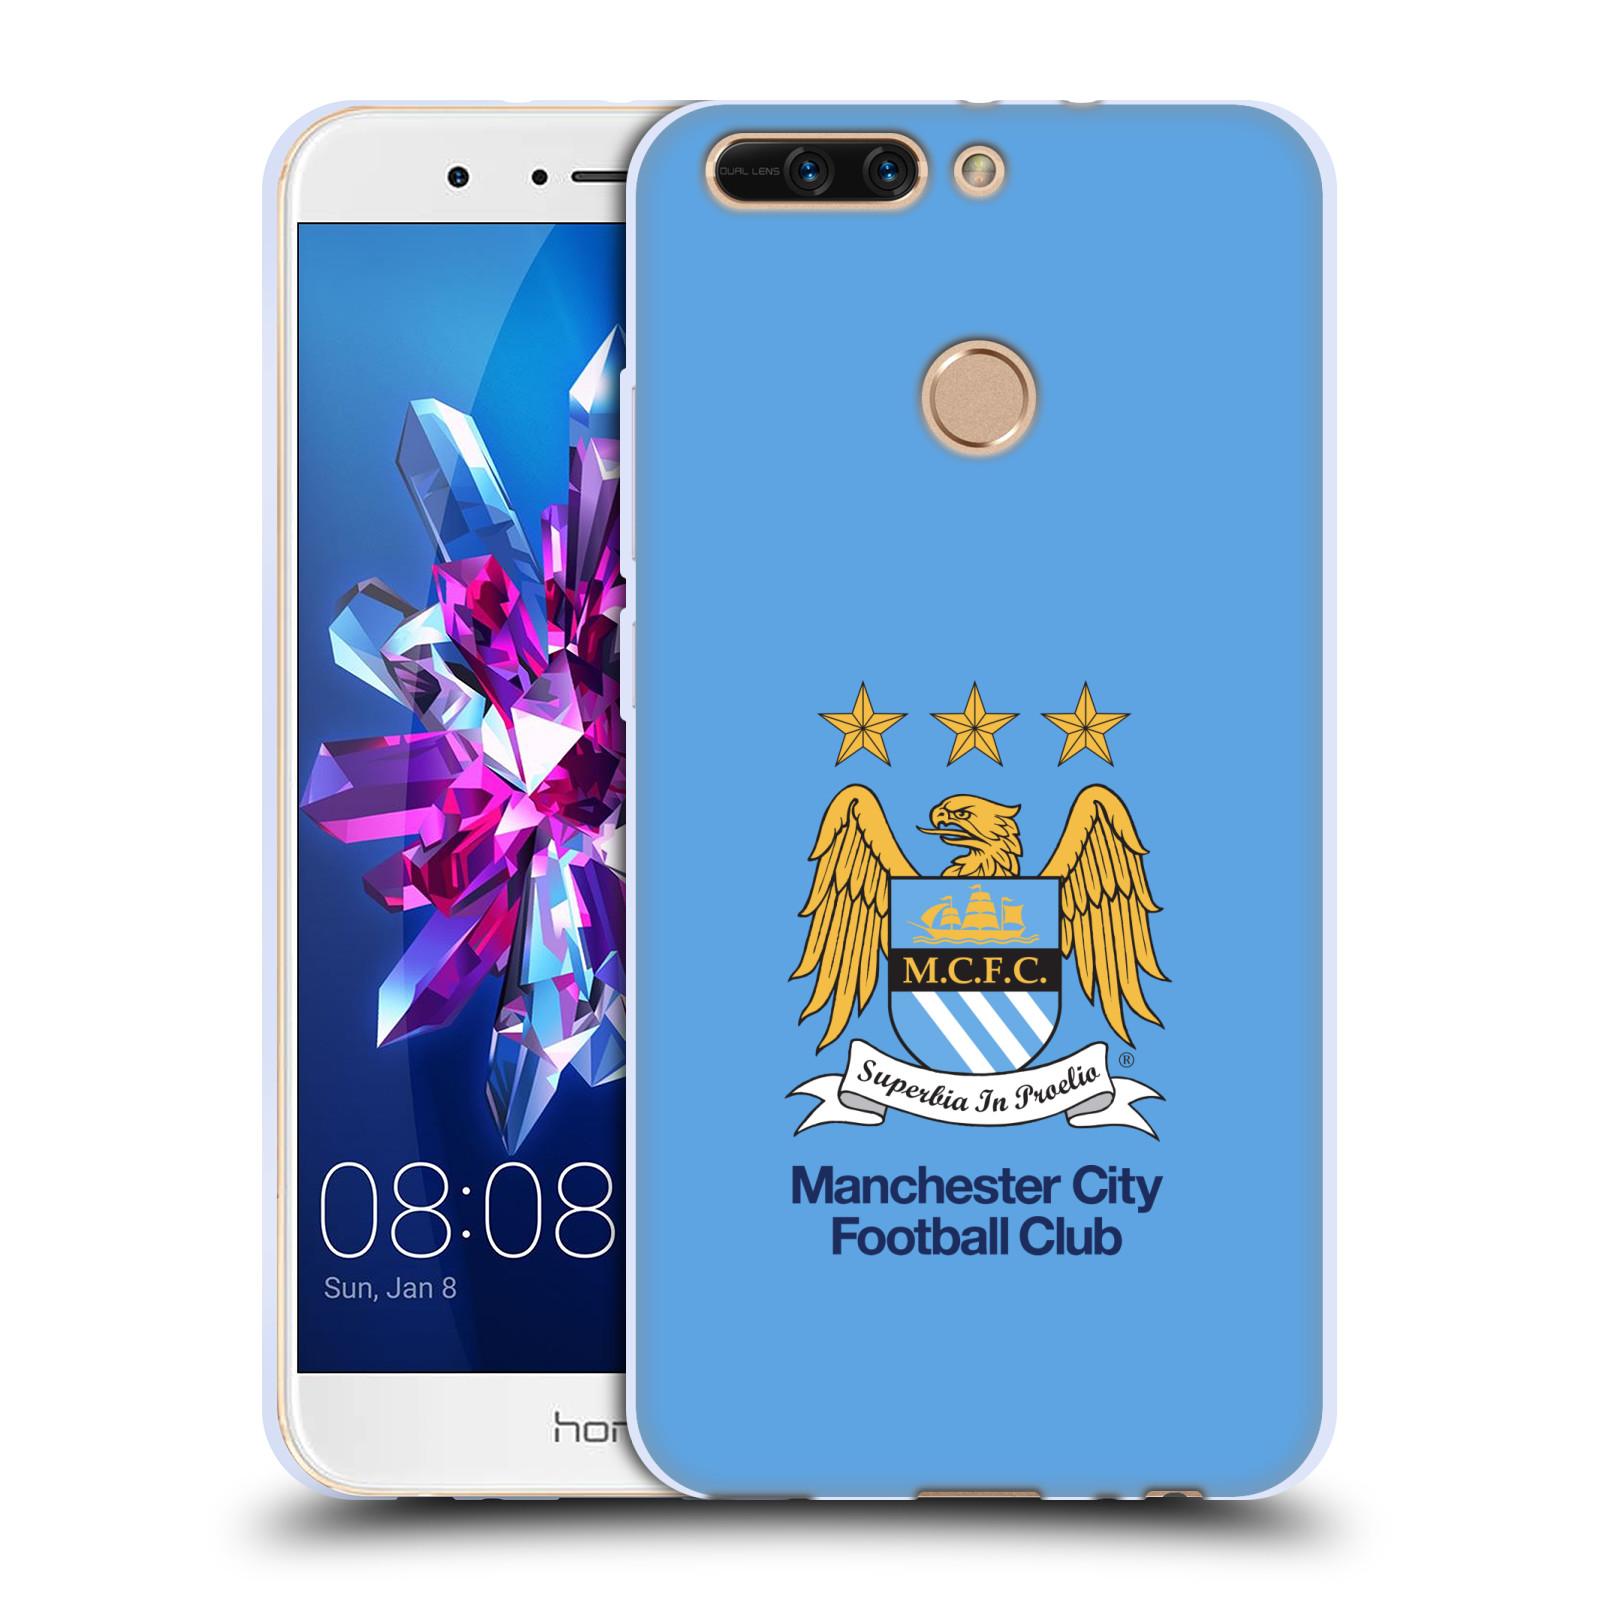 HEAD CASE silikonový obal na mobil Huawei HONOR 8 PRO / Honor 8 PRO DUAL SIM Fotbalový klub Manchester City nebesky modrá pozadí velký znak pták